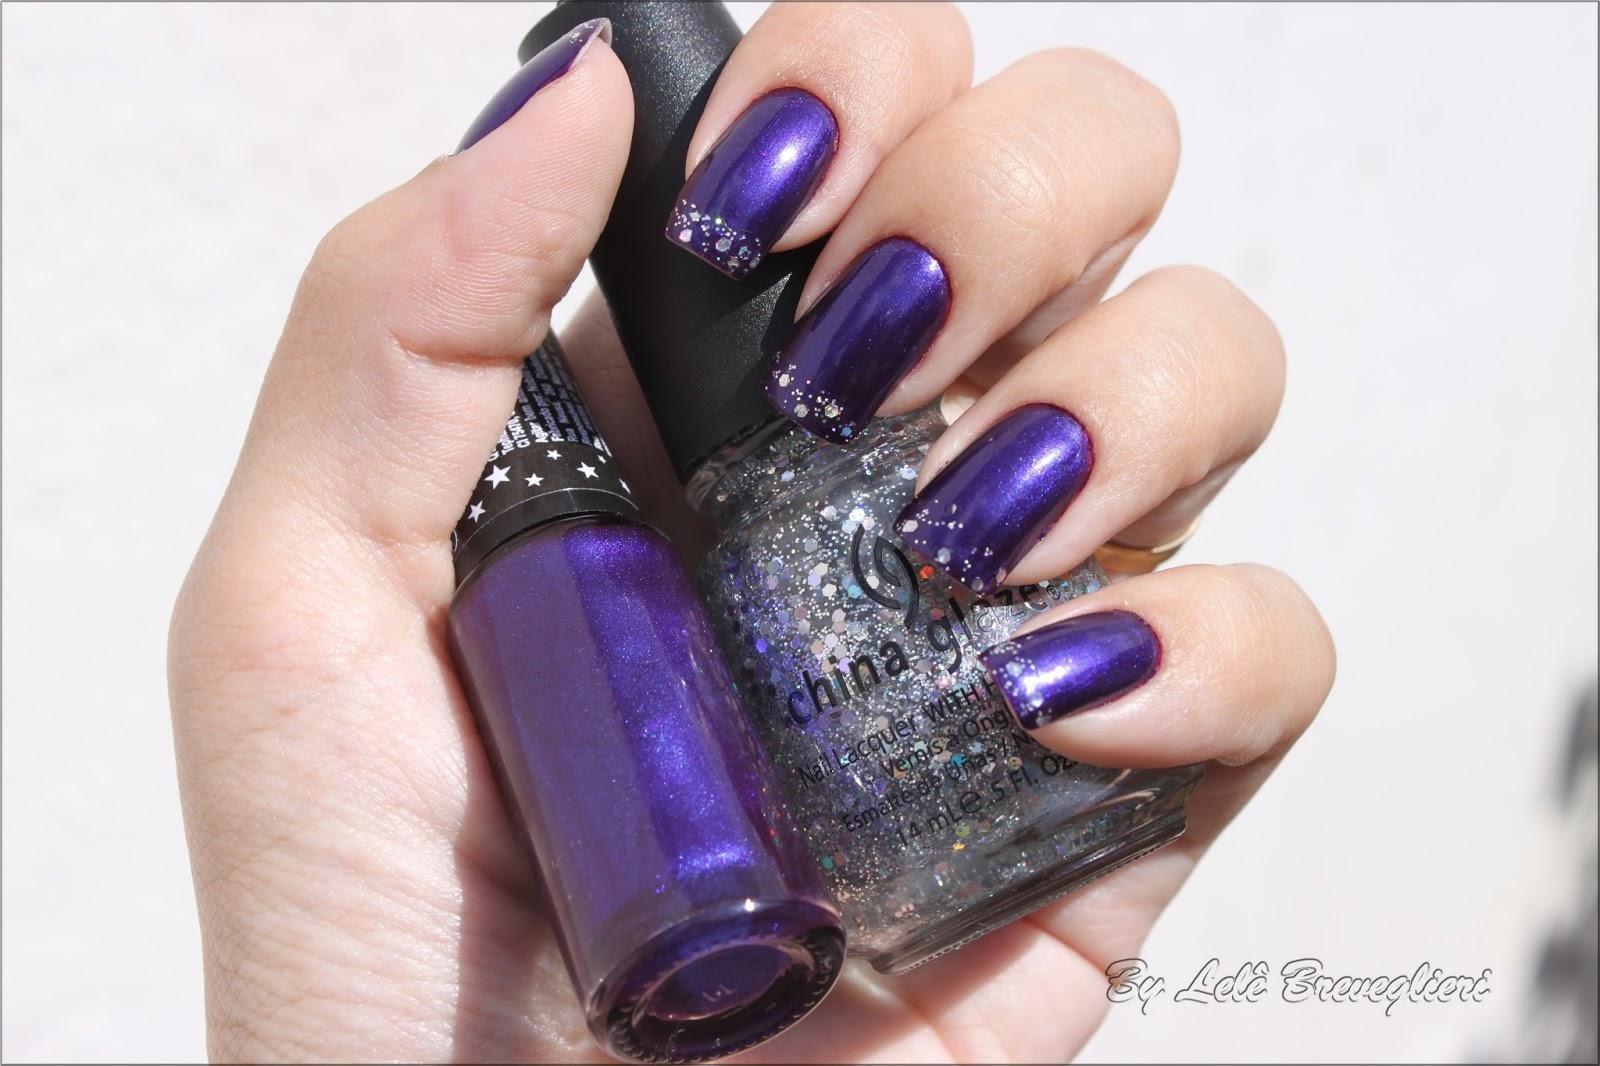 Dark purple & glitter mani - Lele Breveglieri